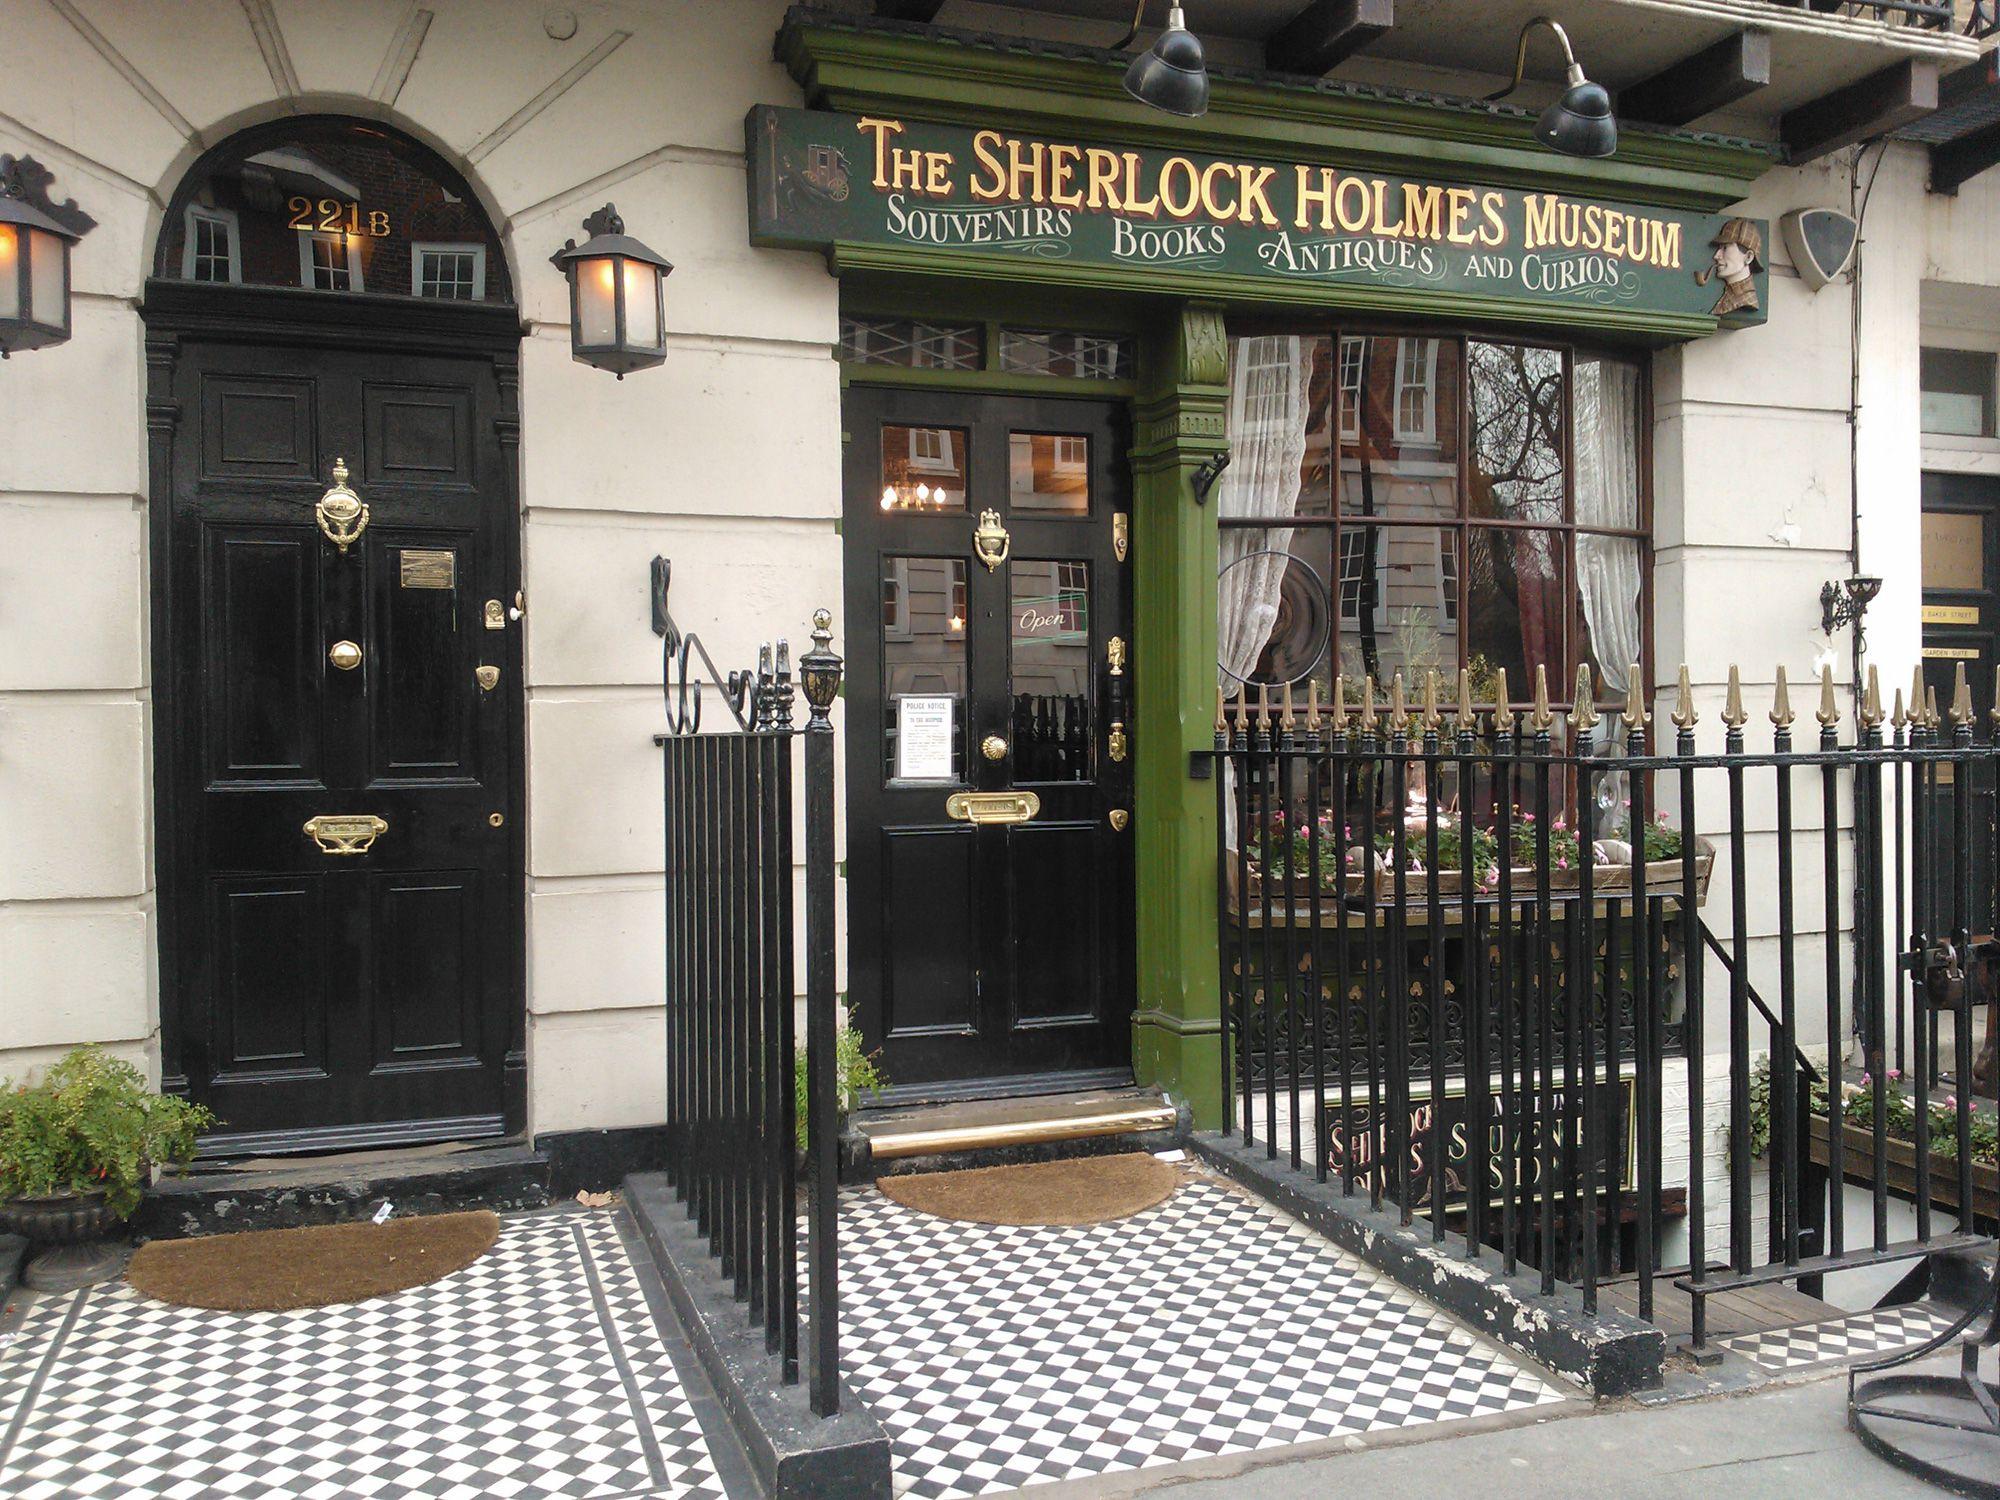 South Street Auto >> Explore London's Sherlock Holmes Museum